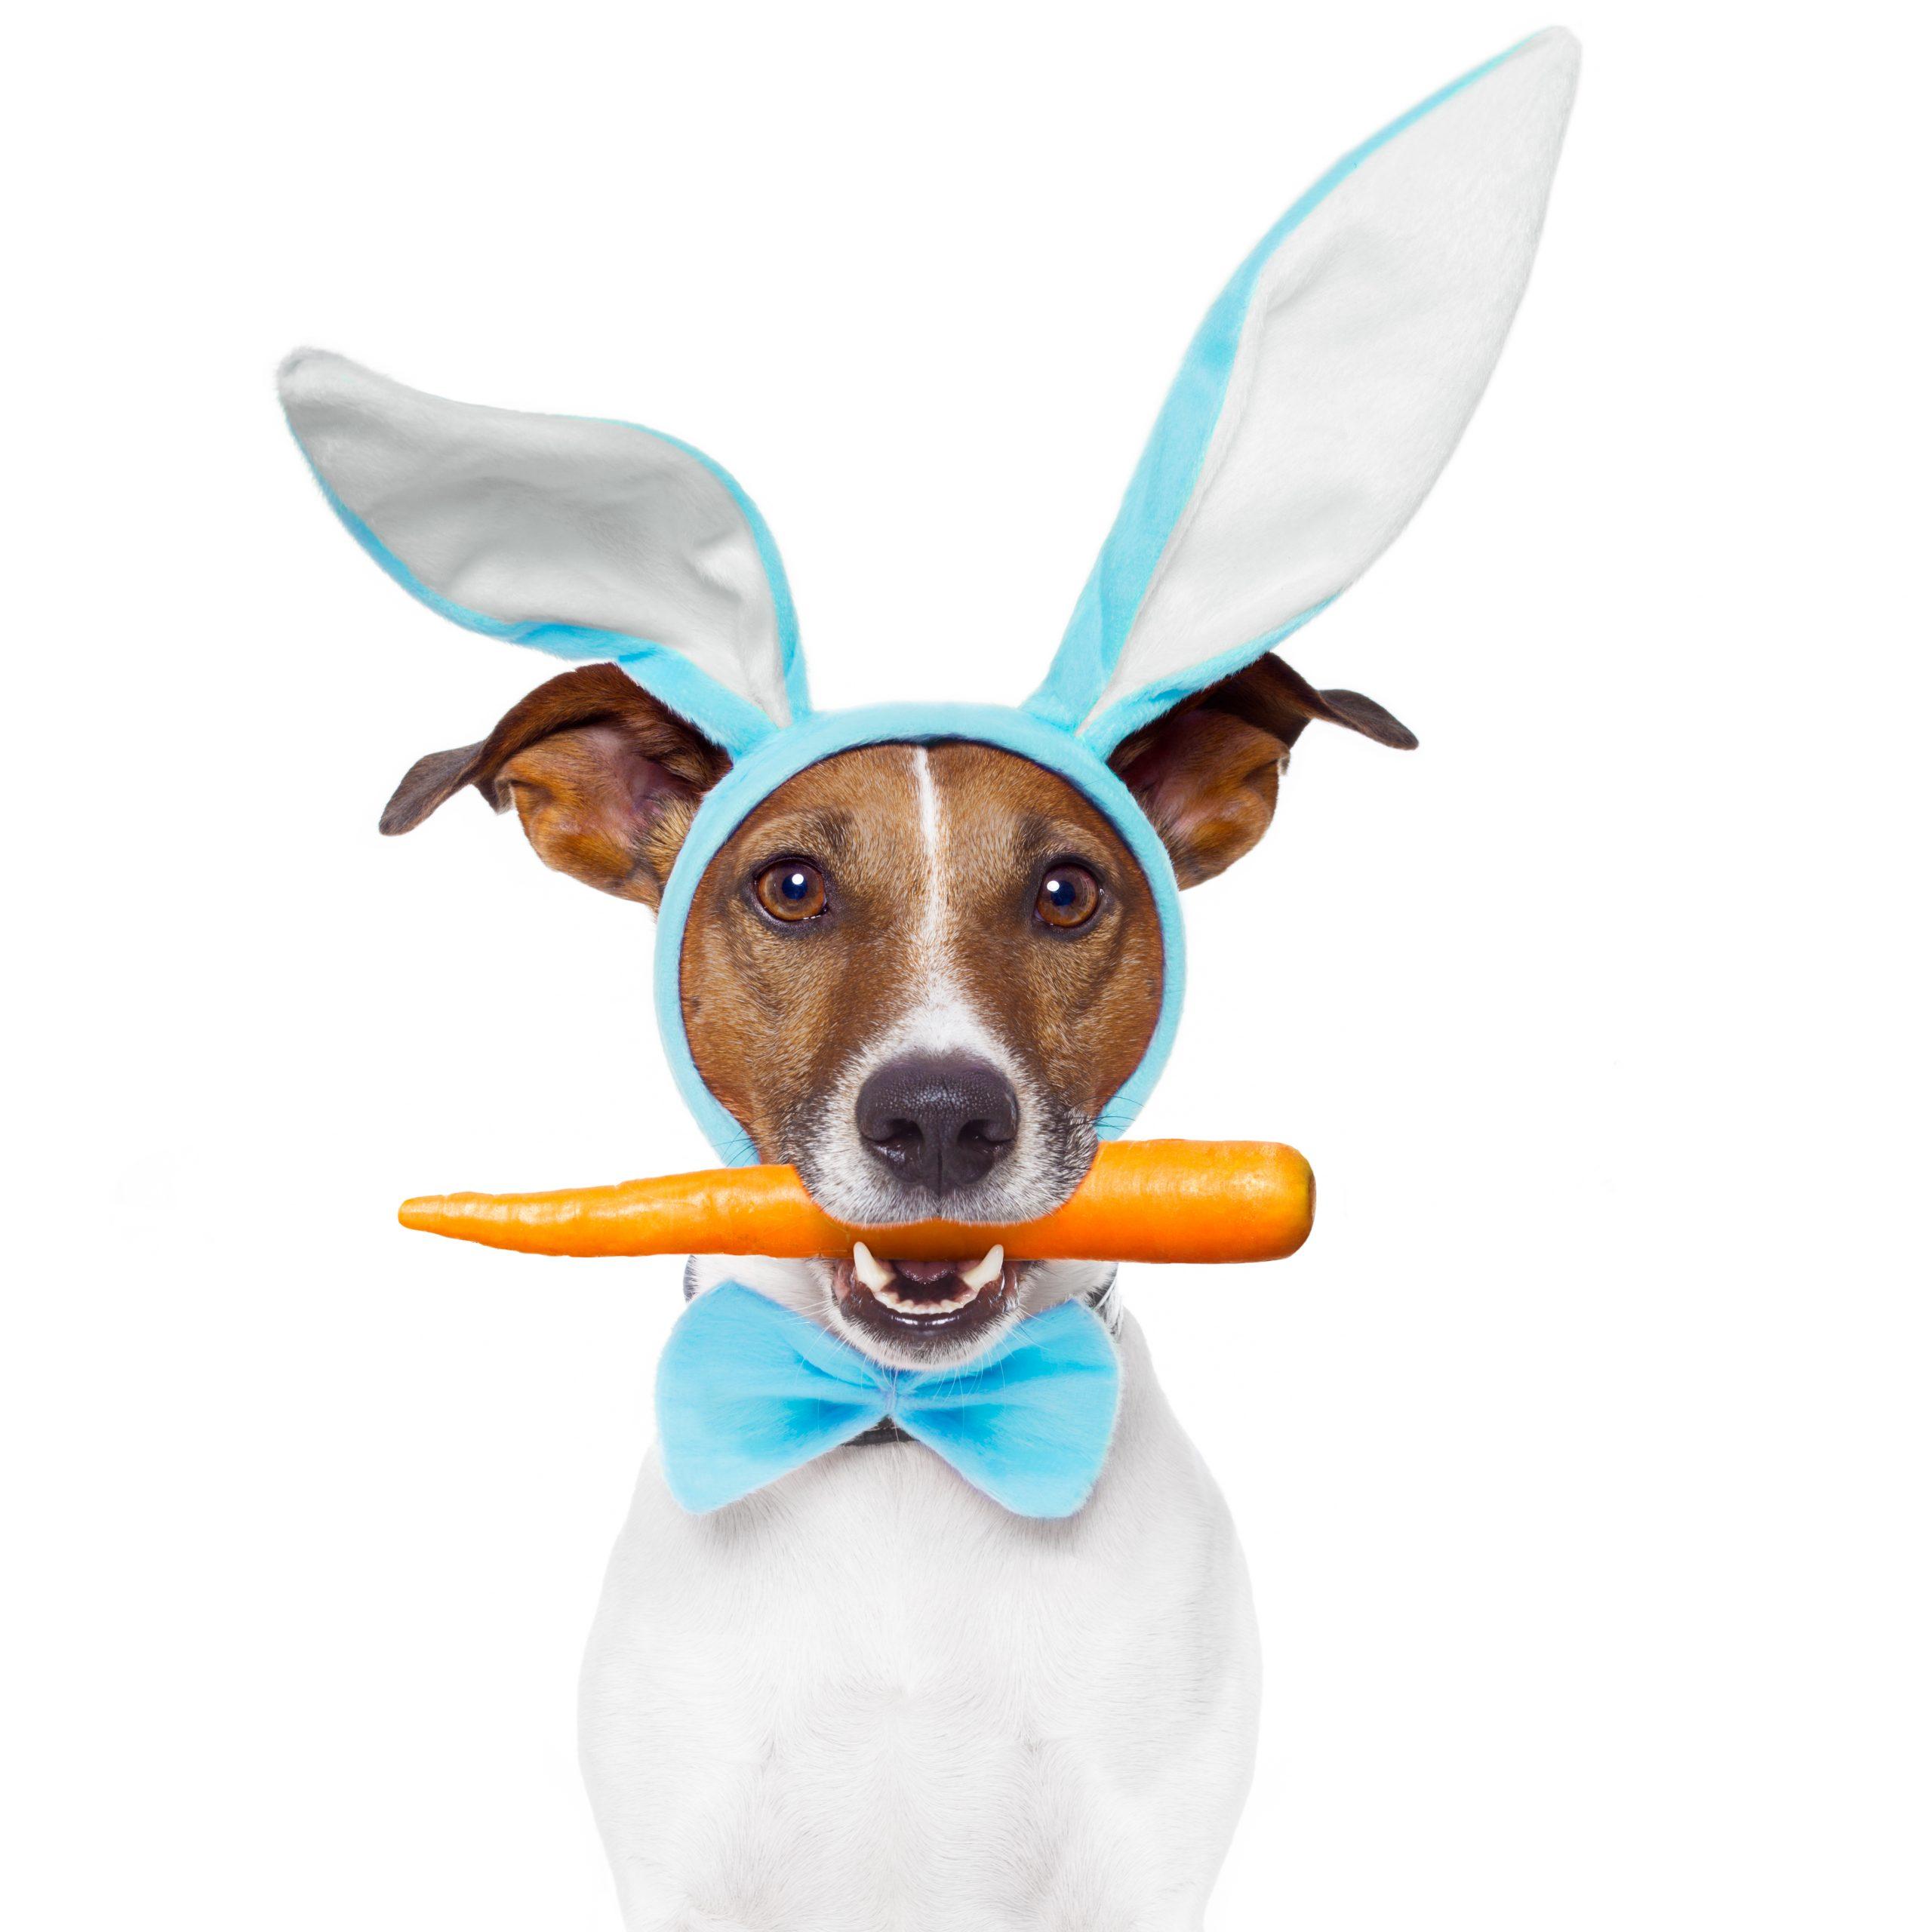 https://depositphotos.com/9681152/stock-photo-dog-with-bunny-ears-and.html